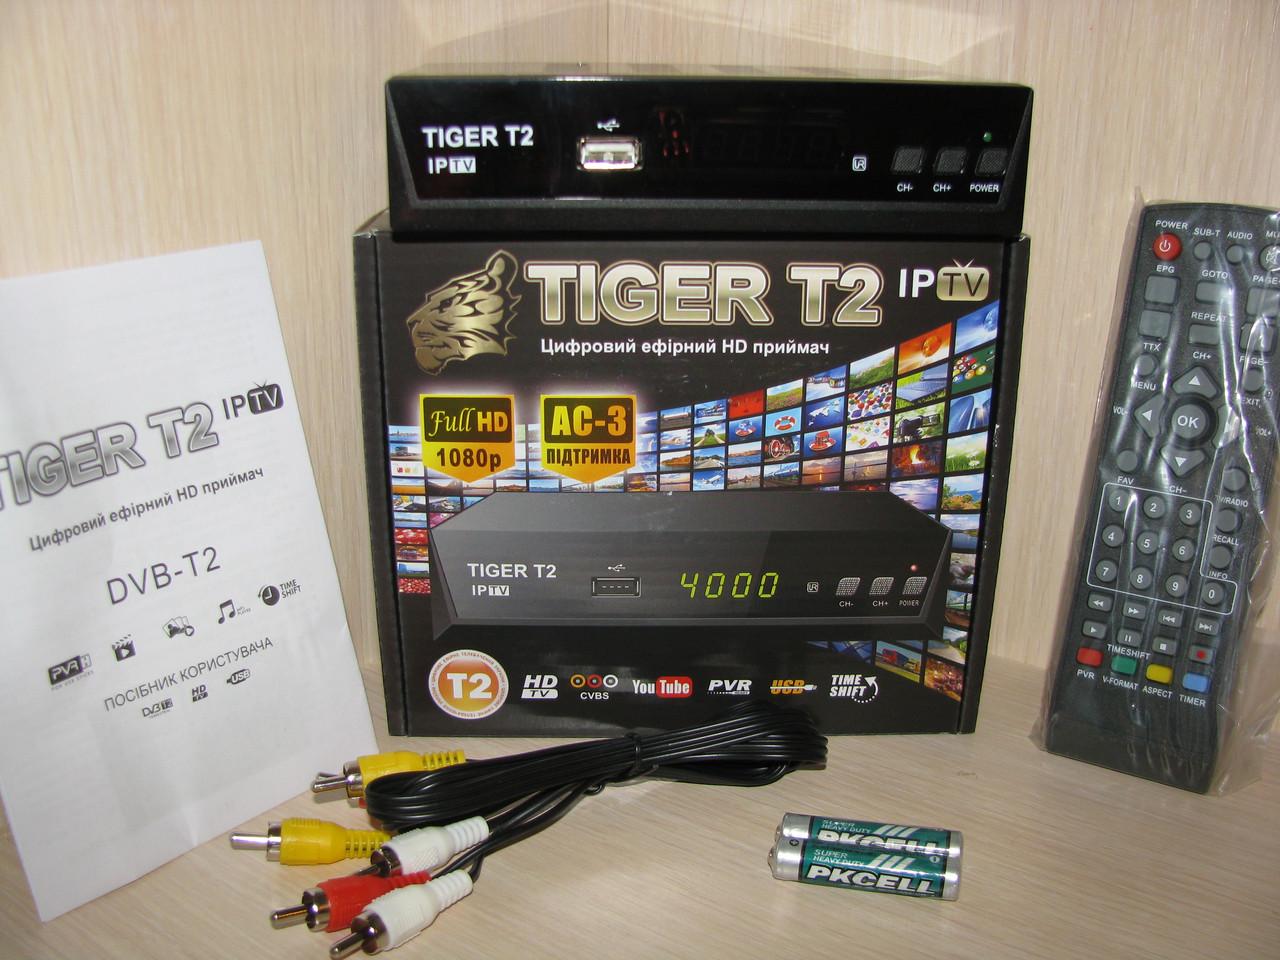 Tiger T2 IPTV тюнер Т2 + AC3 + IPTV